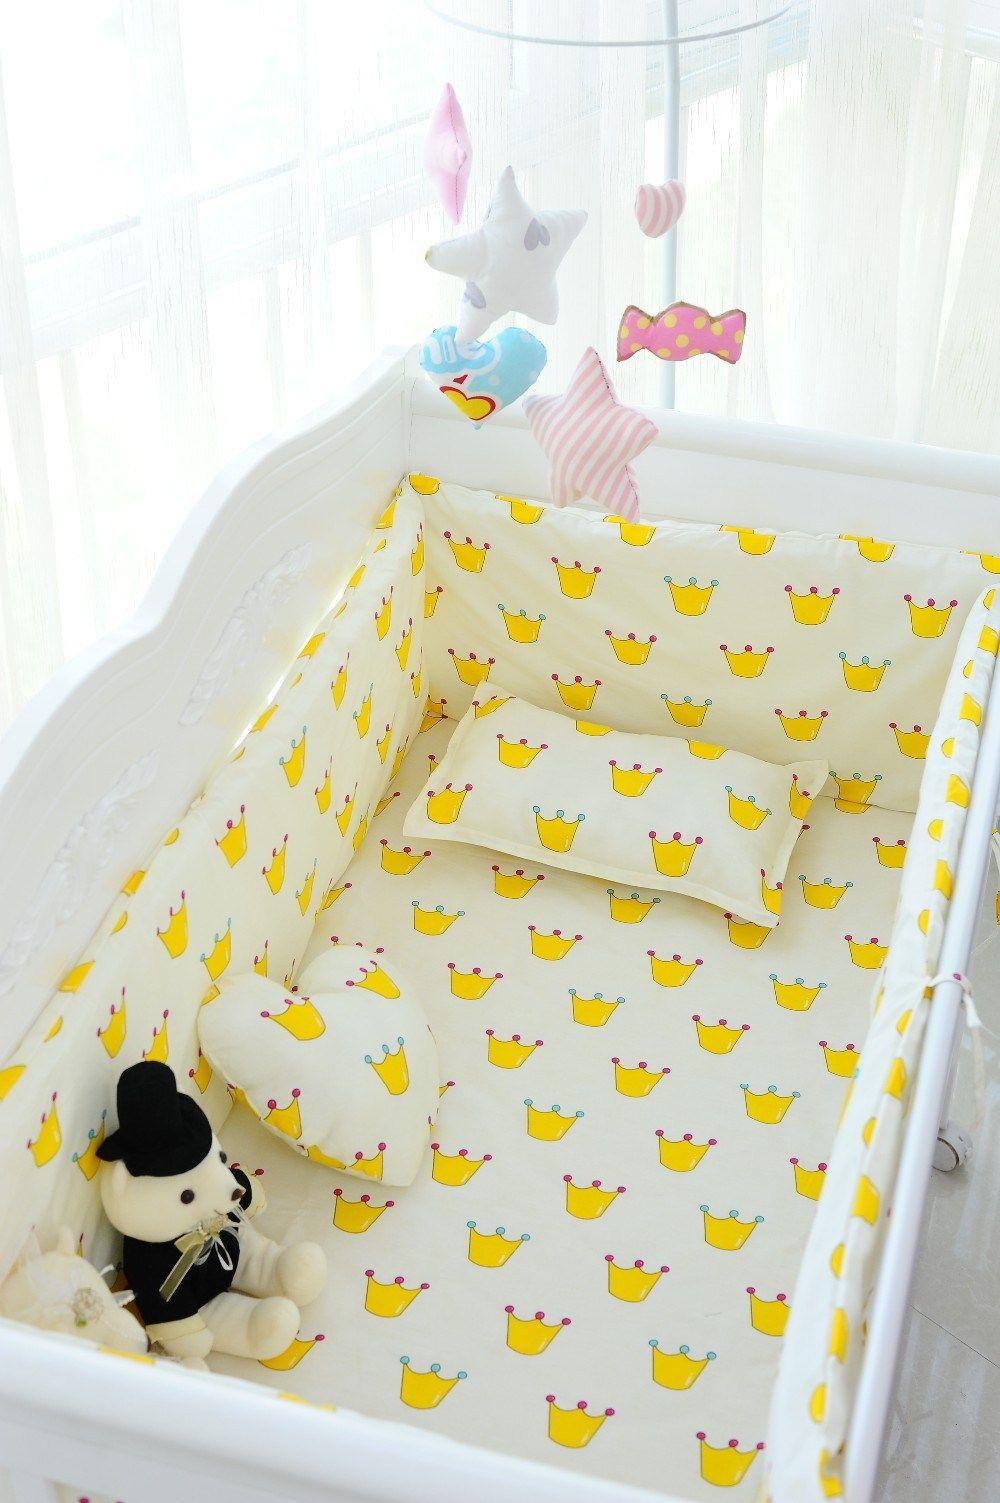 Promocion 6 Unids Kit Bebe Cuna Ropa De Cama Edredon Bebe Parachoques Cuna Sabanas Parachoques Sabanas Cubierta De Almohada Baby Crib Sets Baby Crib Bumpers Baby Bedding Sets